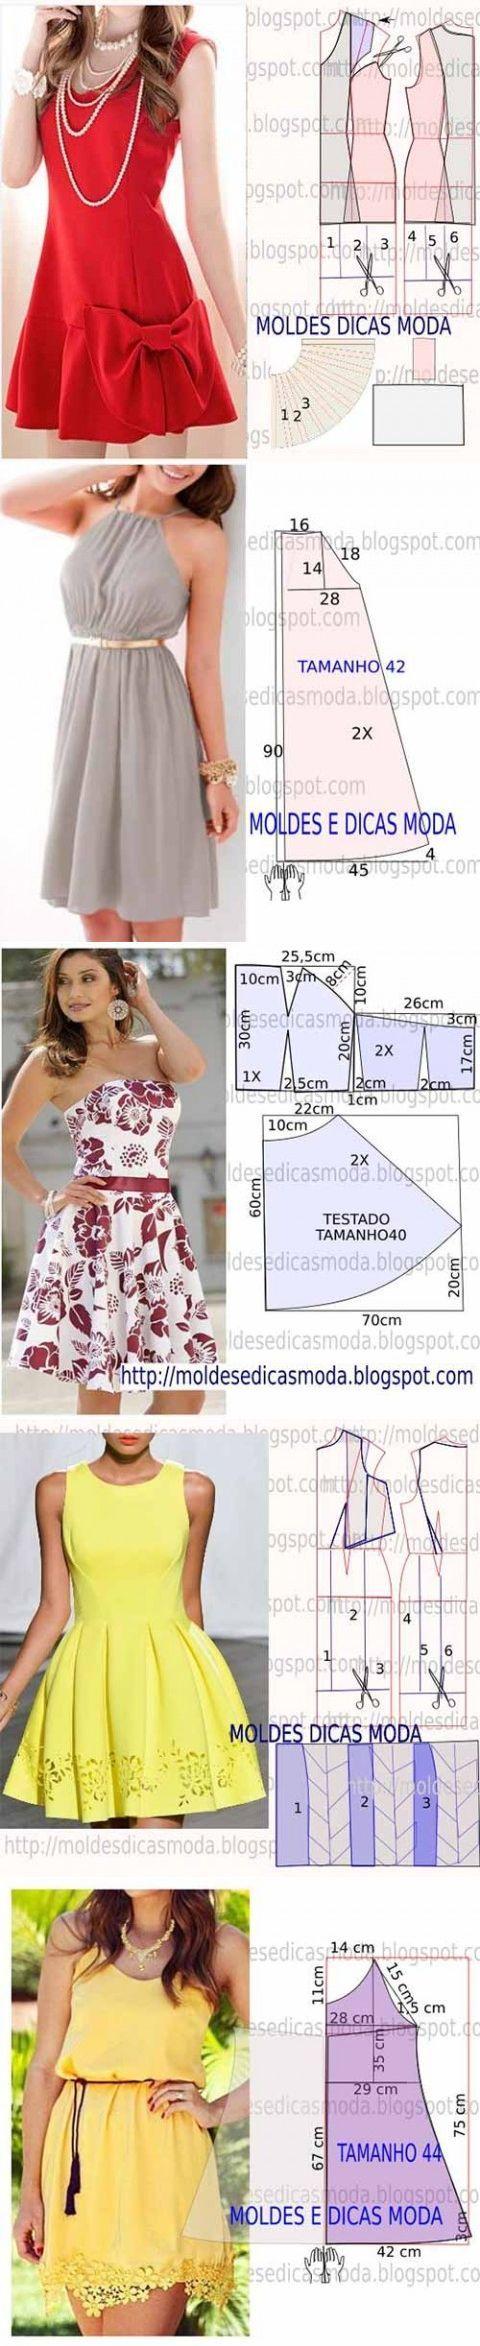 МК | designing | Pinterest | Vestidos, Costura and Patrones de vestidos